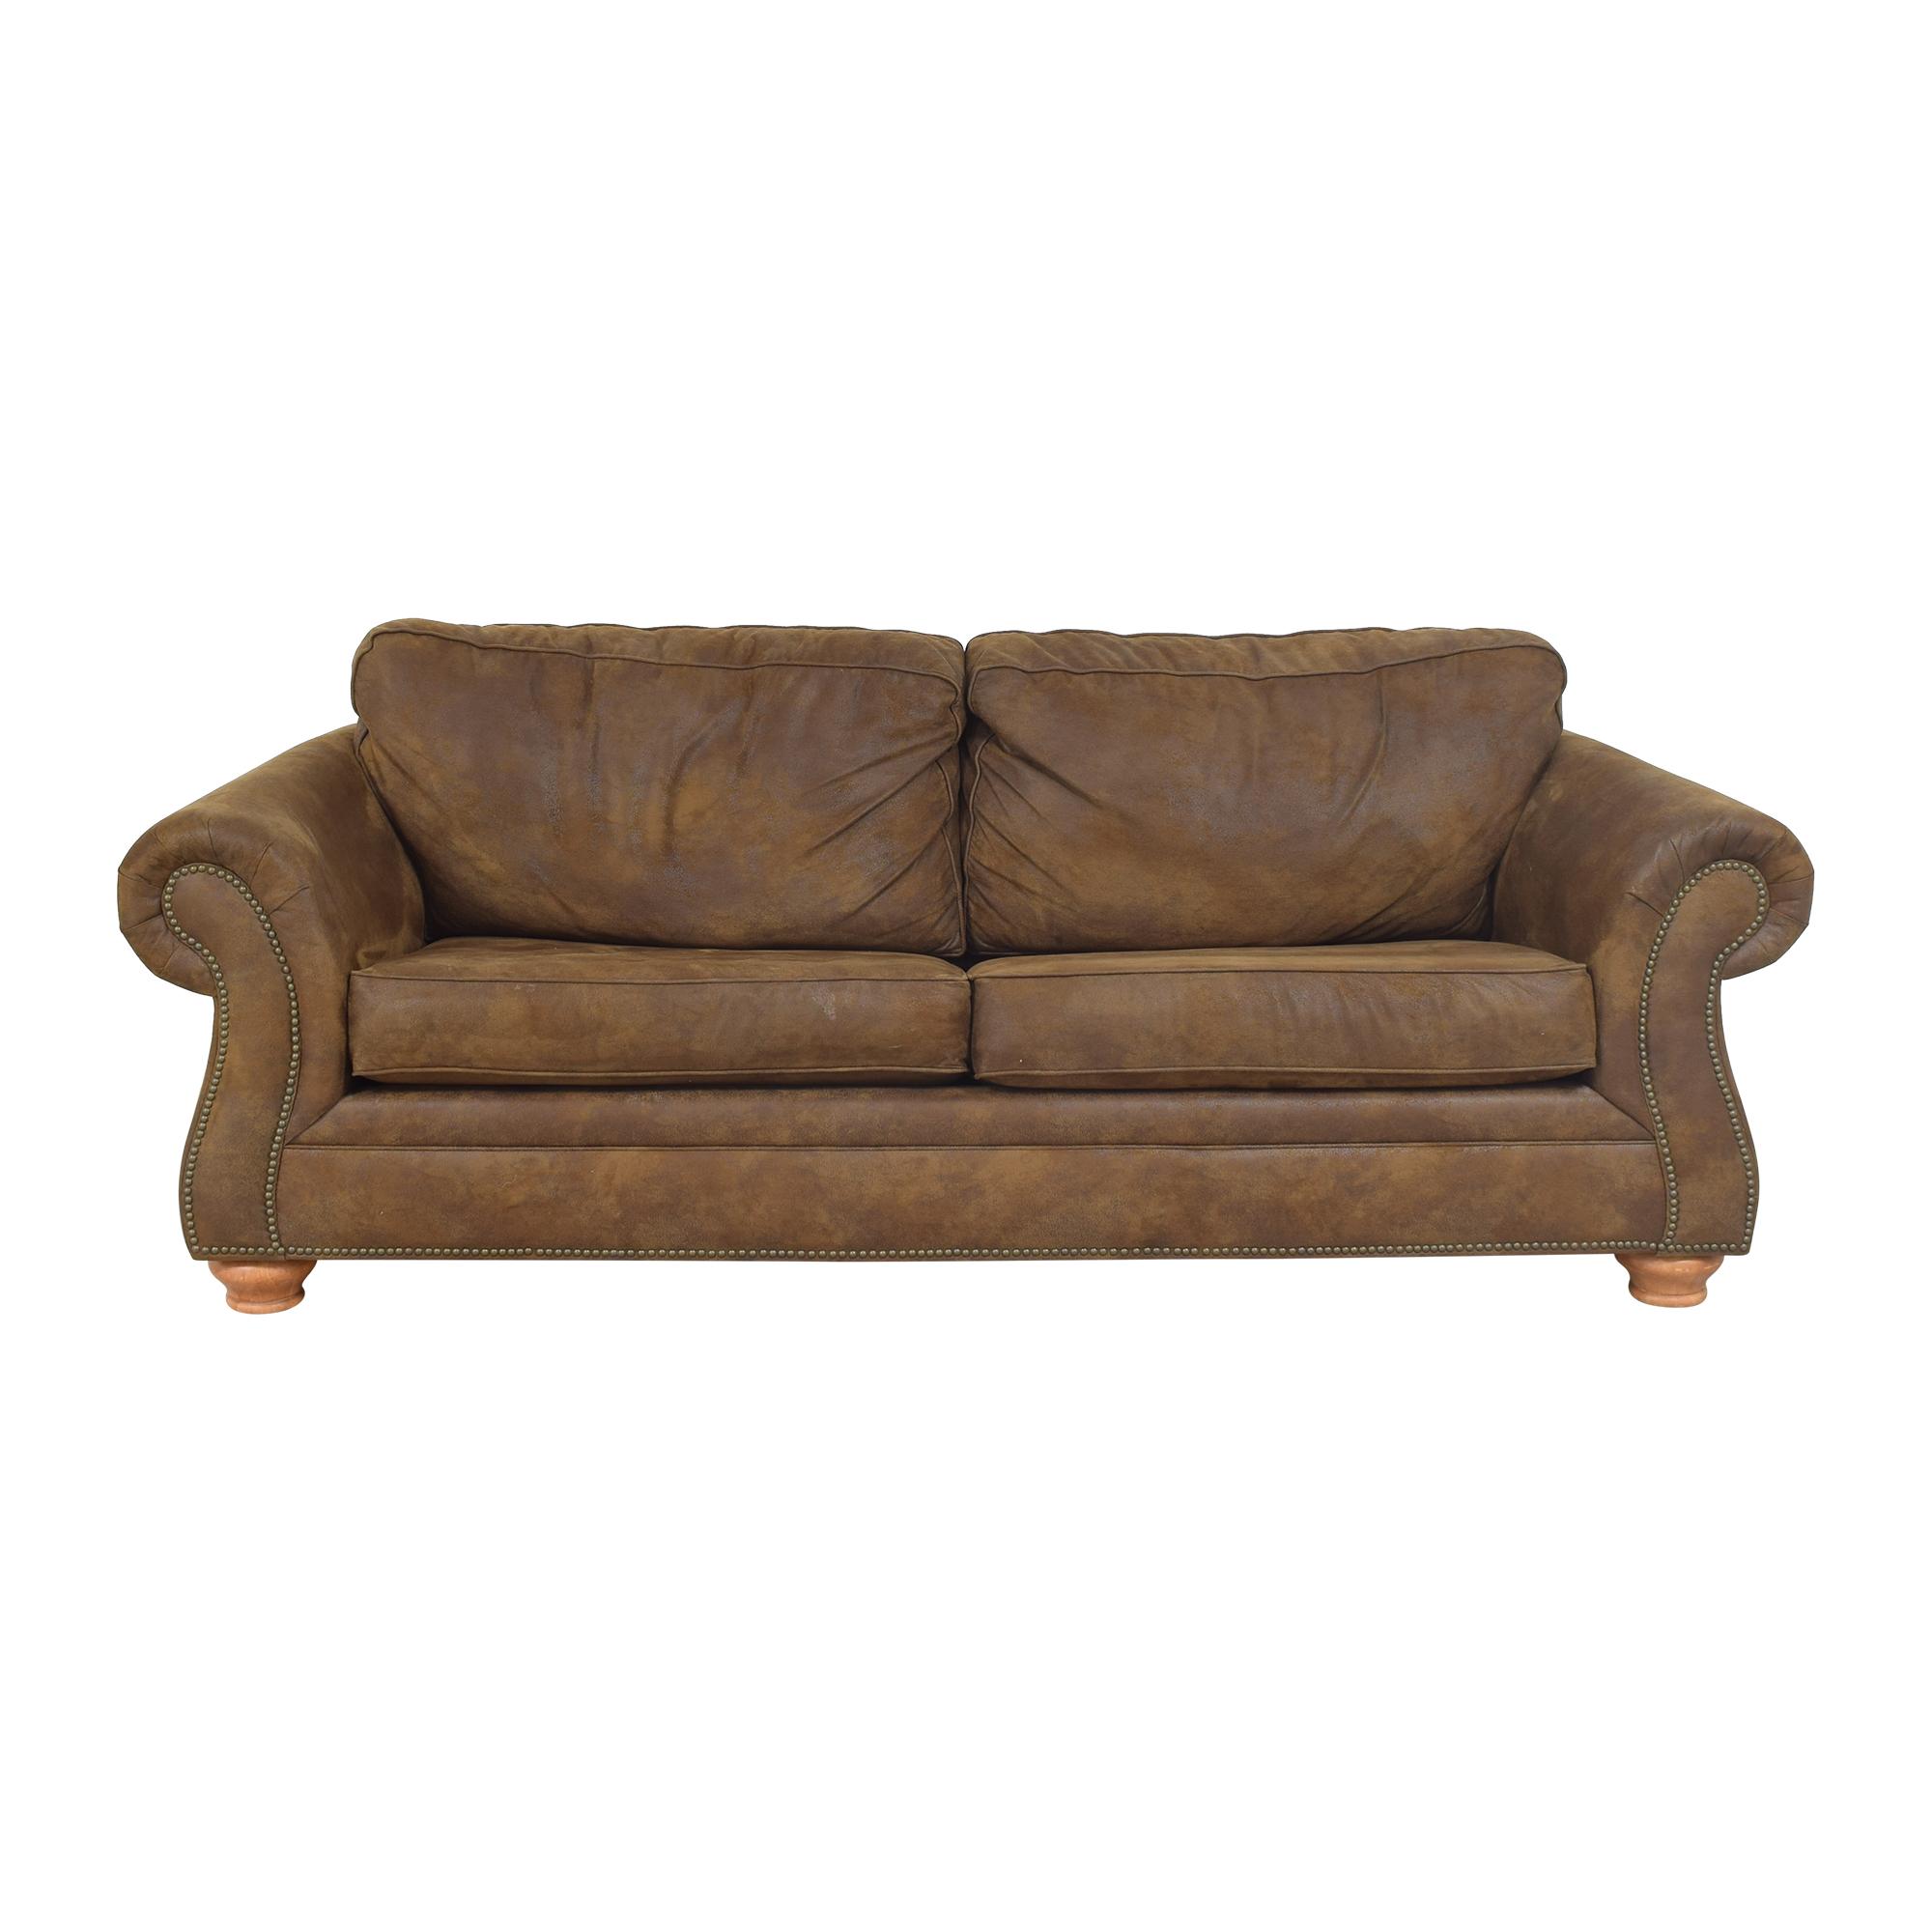 Raymour & Flanigan Raymour & Flanigan Canyon Ridge Sleeper Sofa price